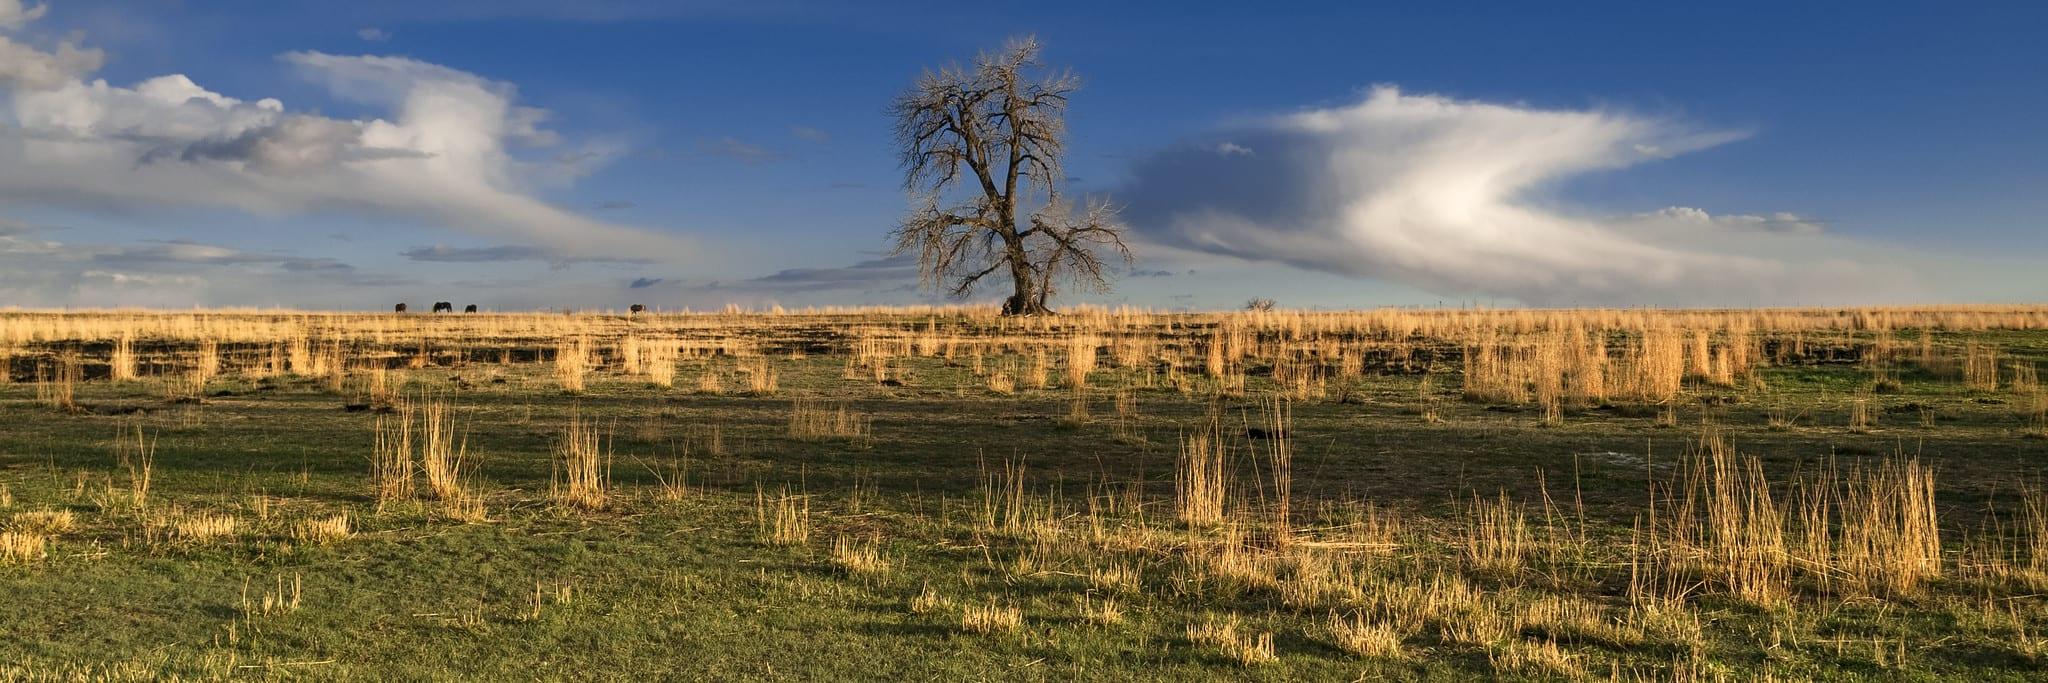 Plains cottonwood tree in Colorado